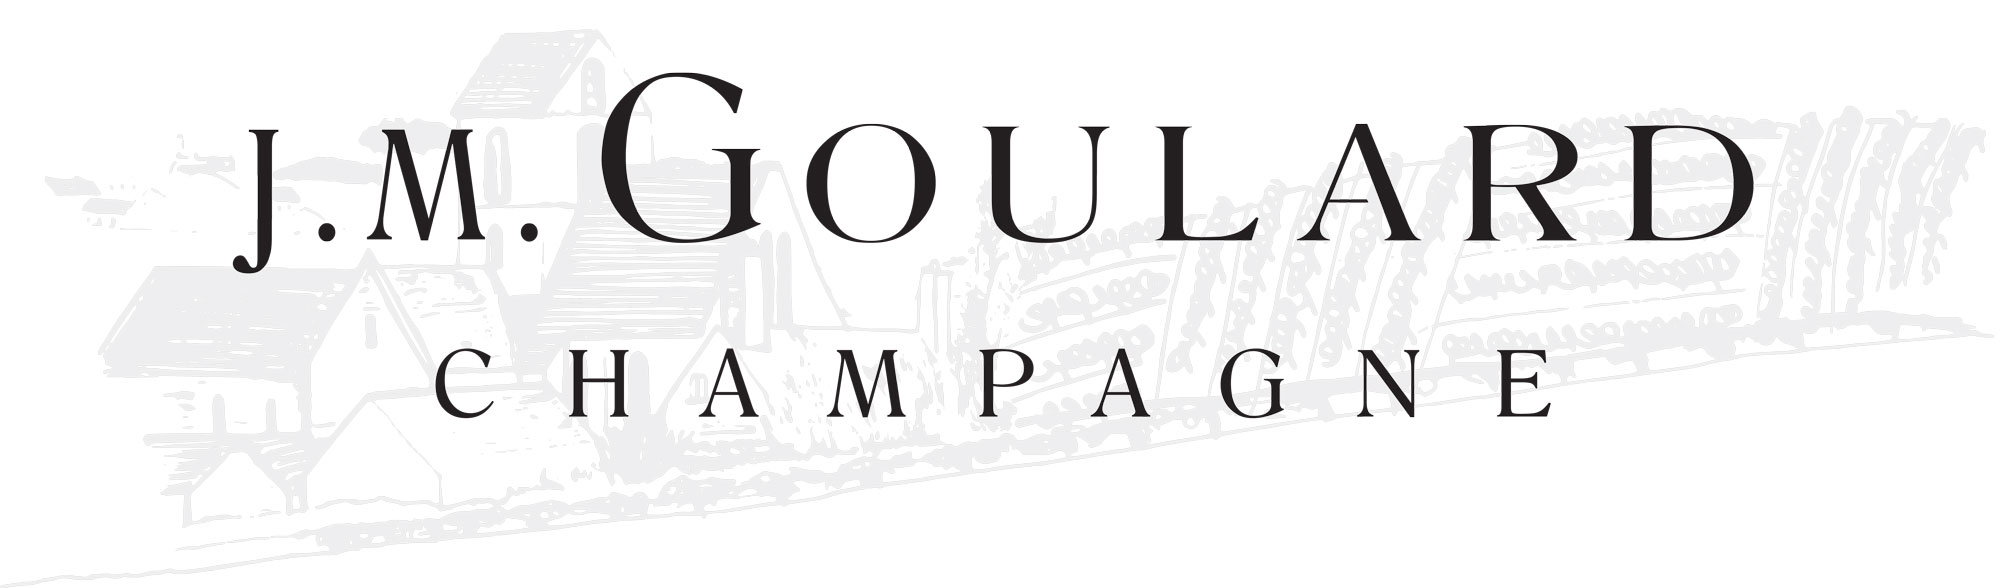 Champagne JM Goulard